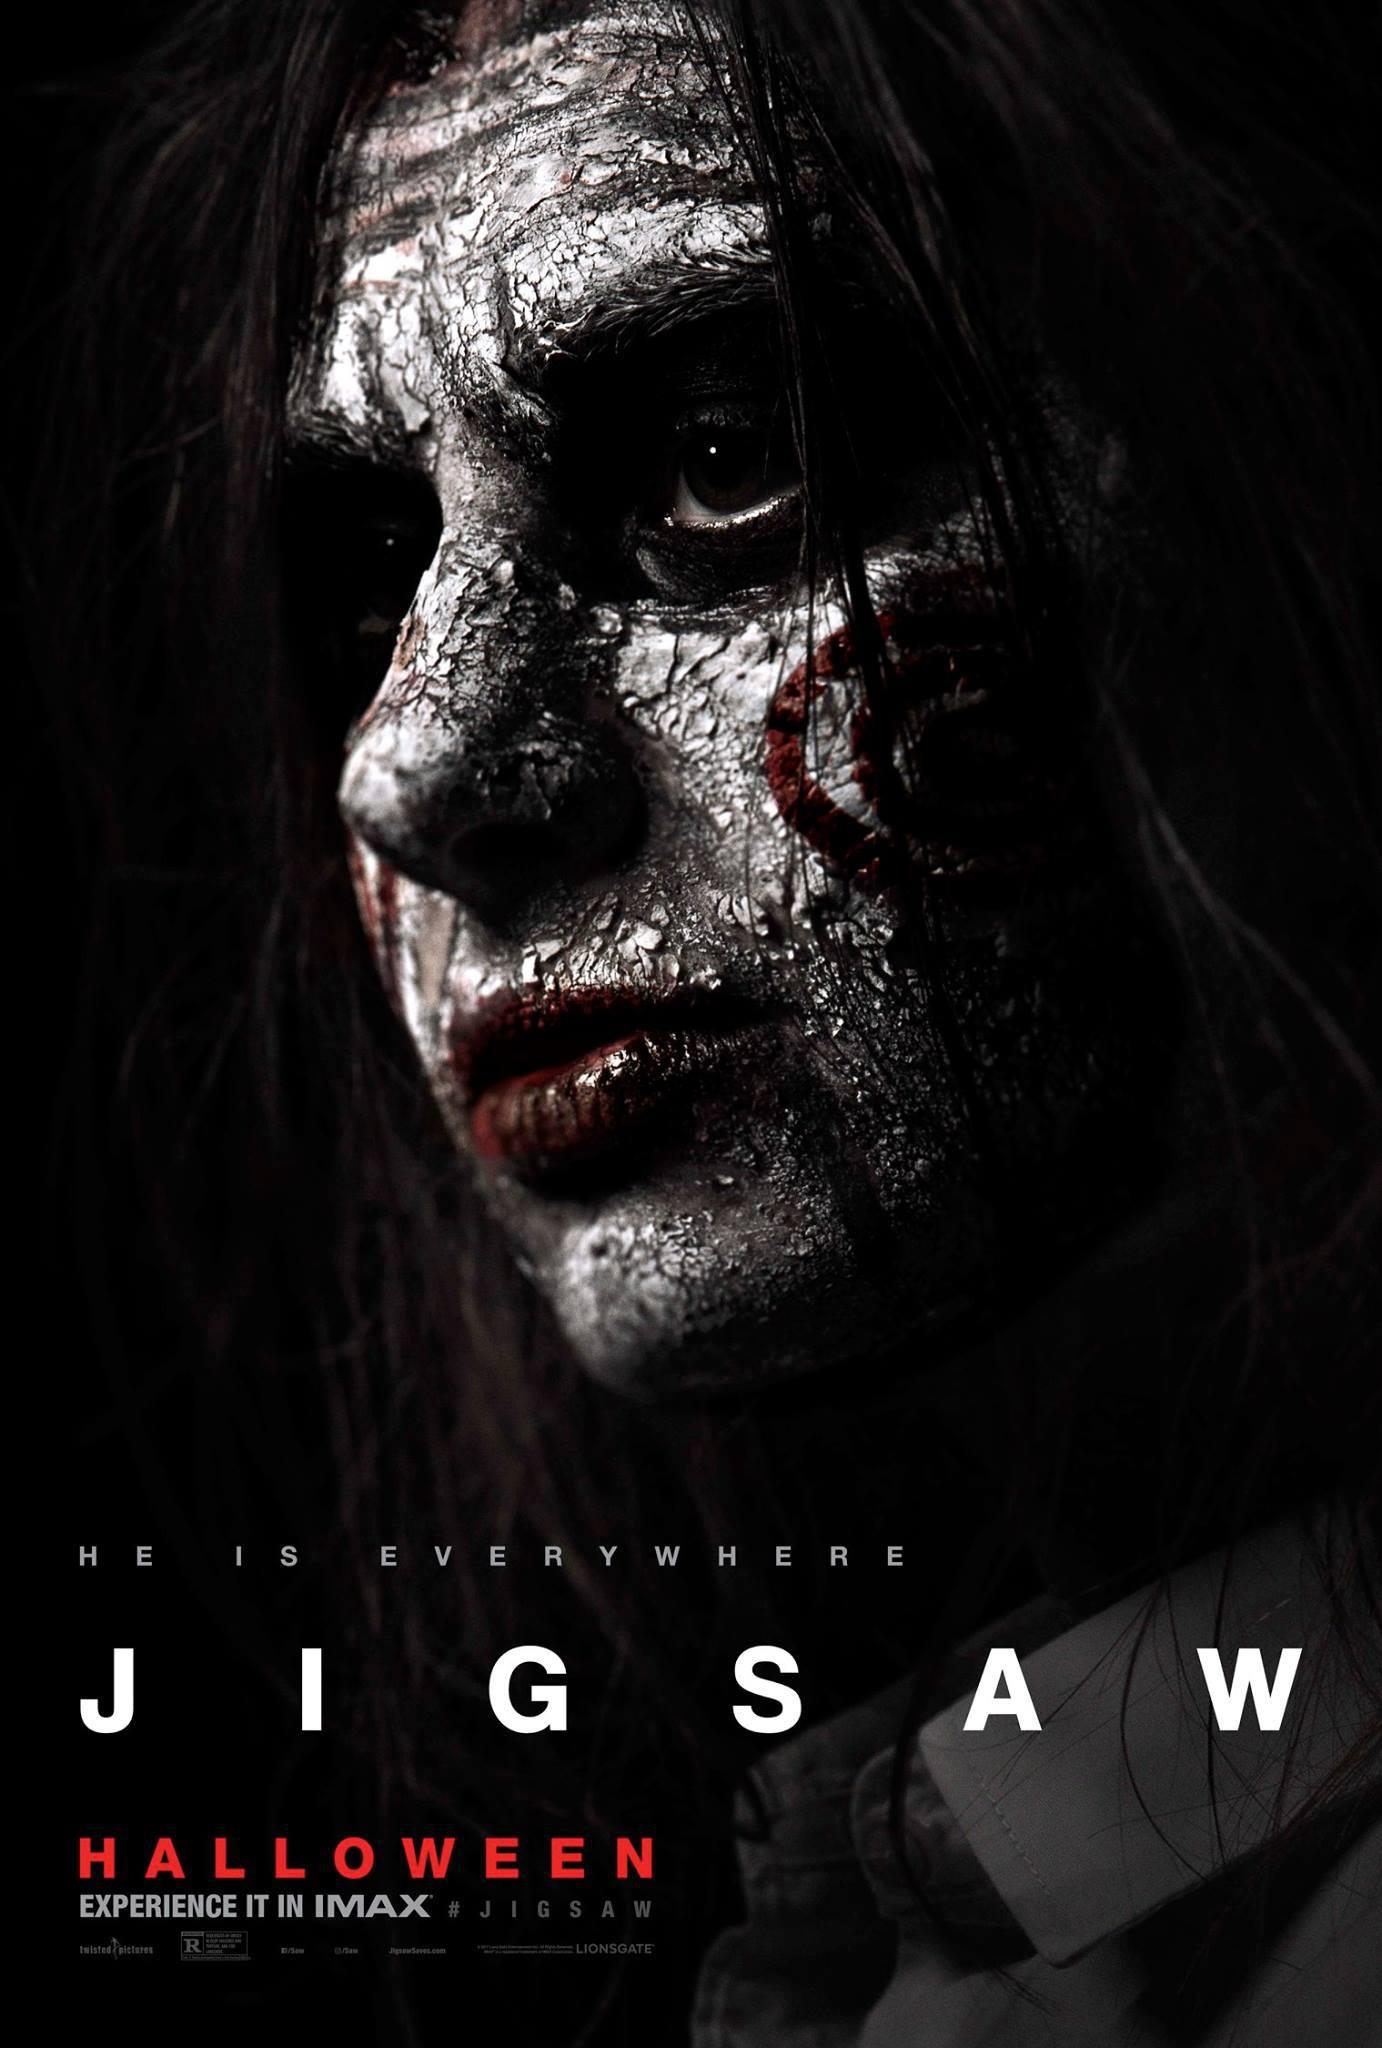 Jigsaw character3